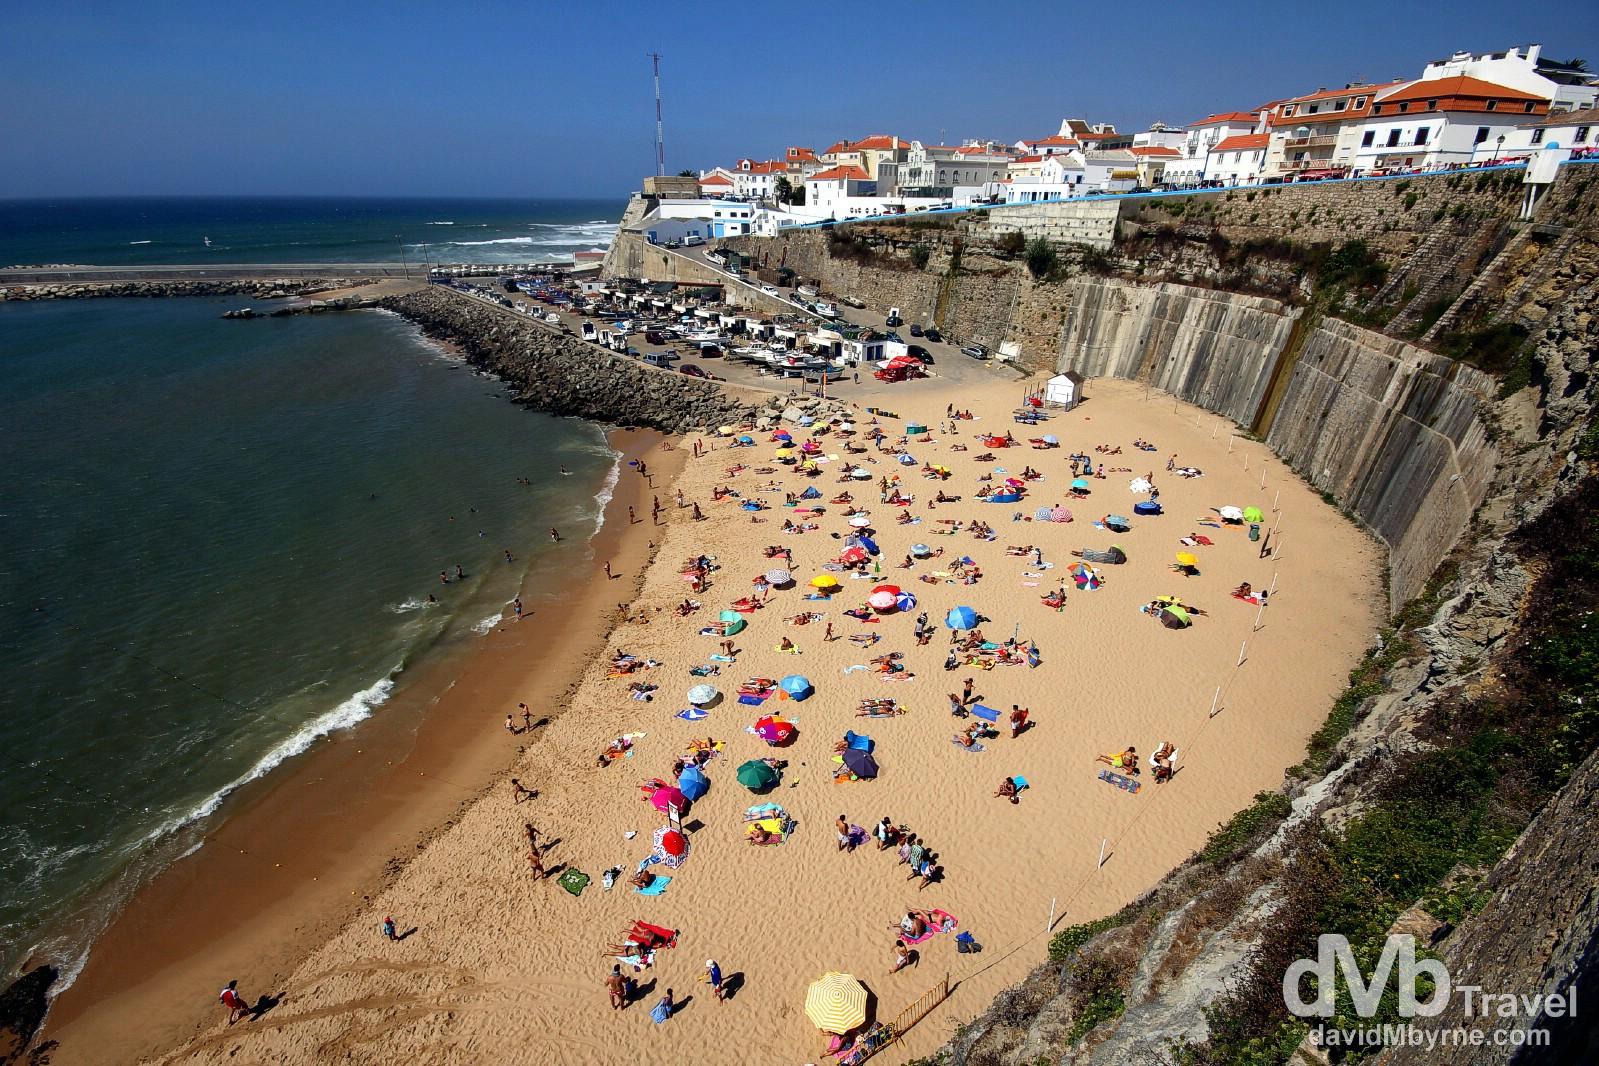 Praia dos Pescadores (Fisherman's Beach) in Ericeira, Mafra, Portugal. August 24th 2013.